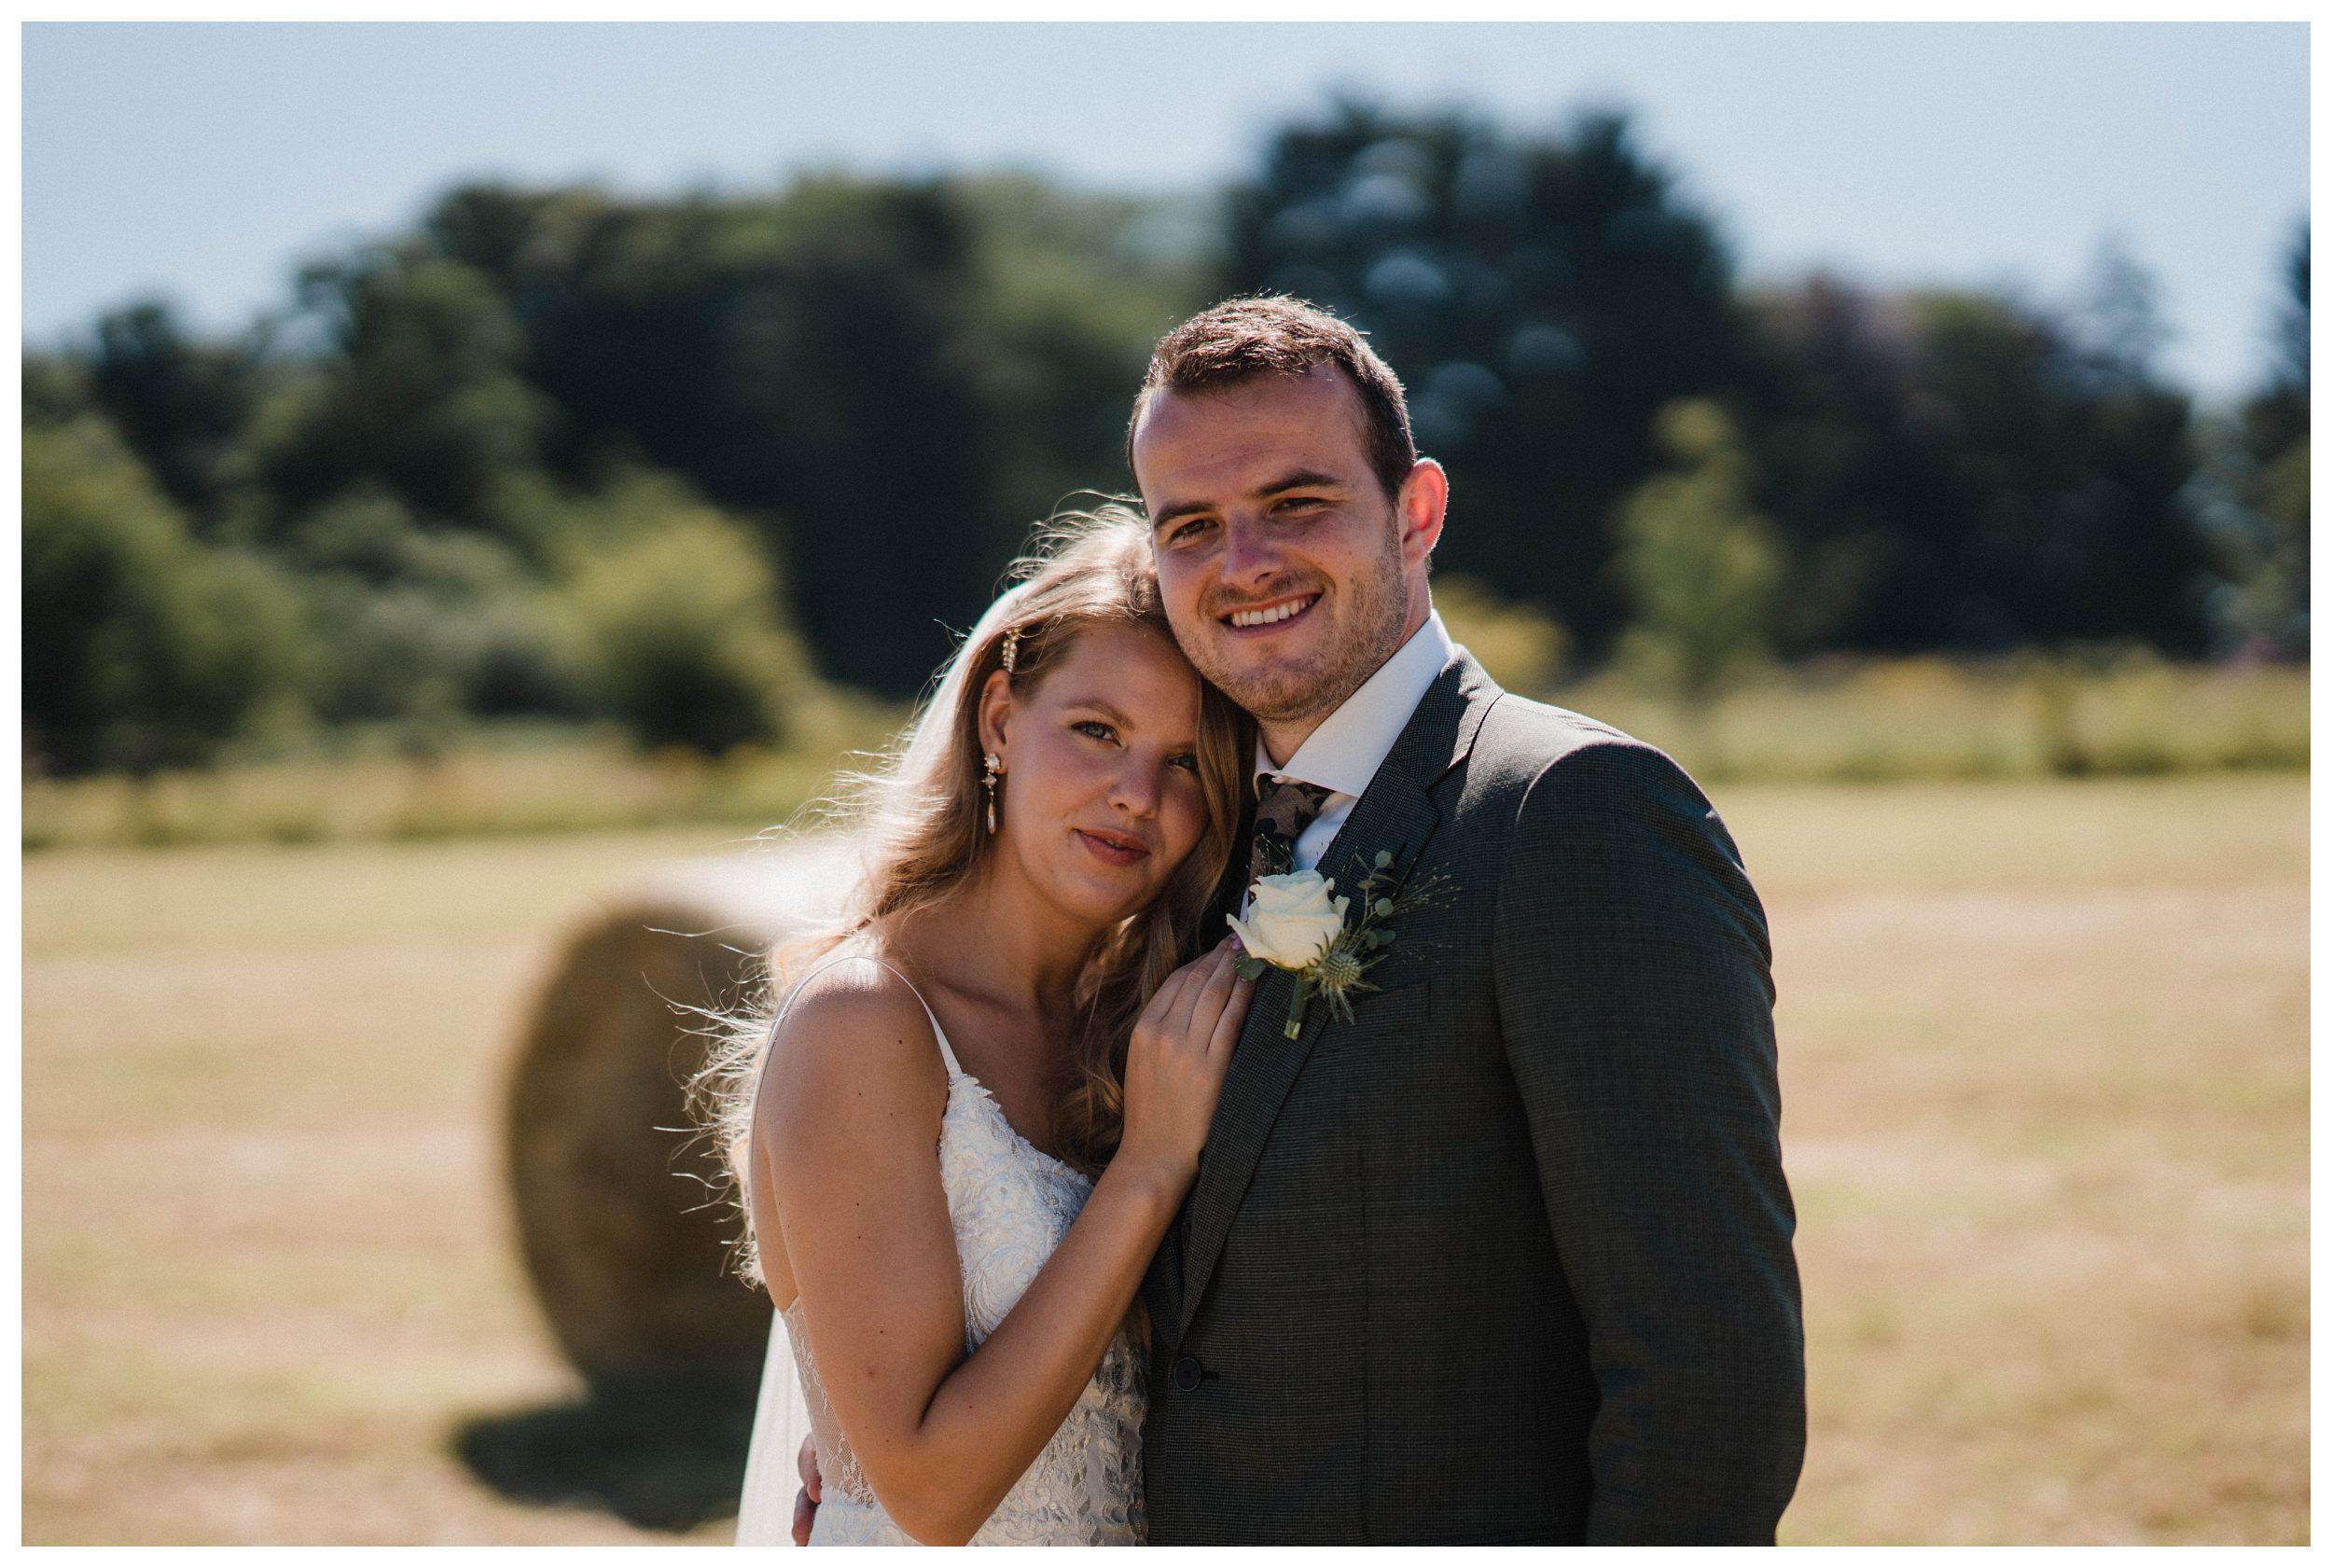 huwelijksfotograaf bruidsfotograaf destinationwedding huwelijksfotografie in ardennen nederland (32).jpg